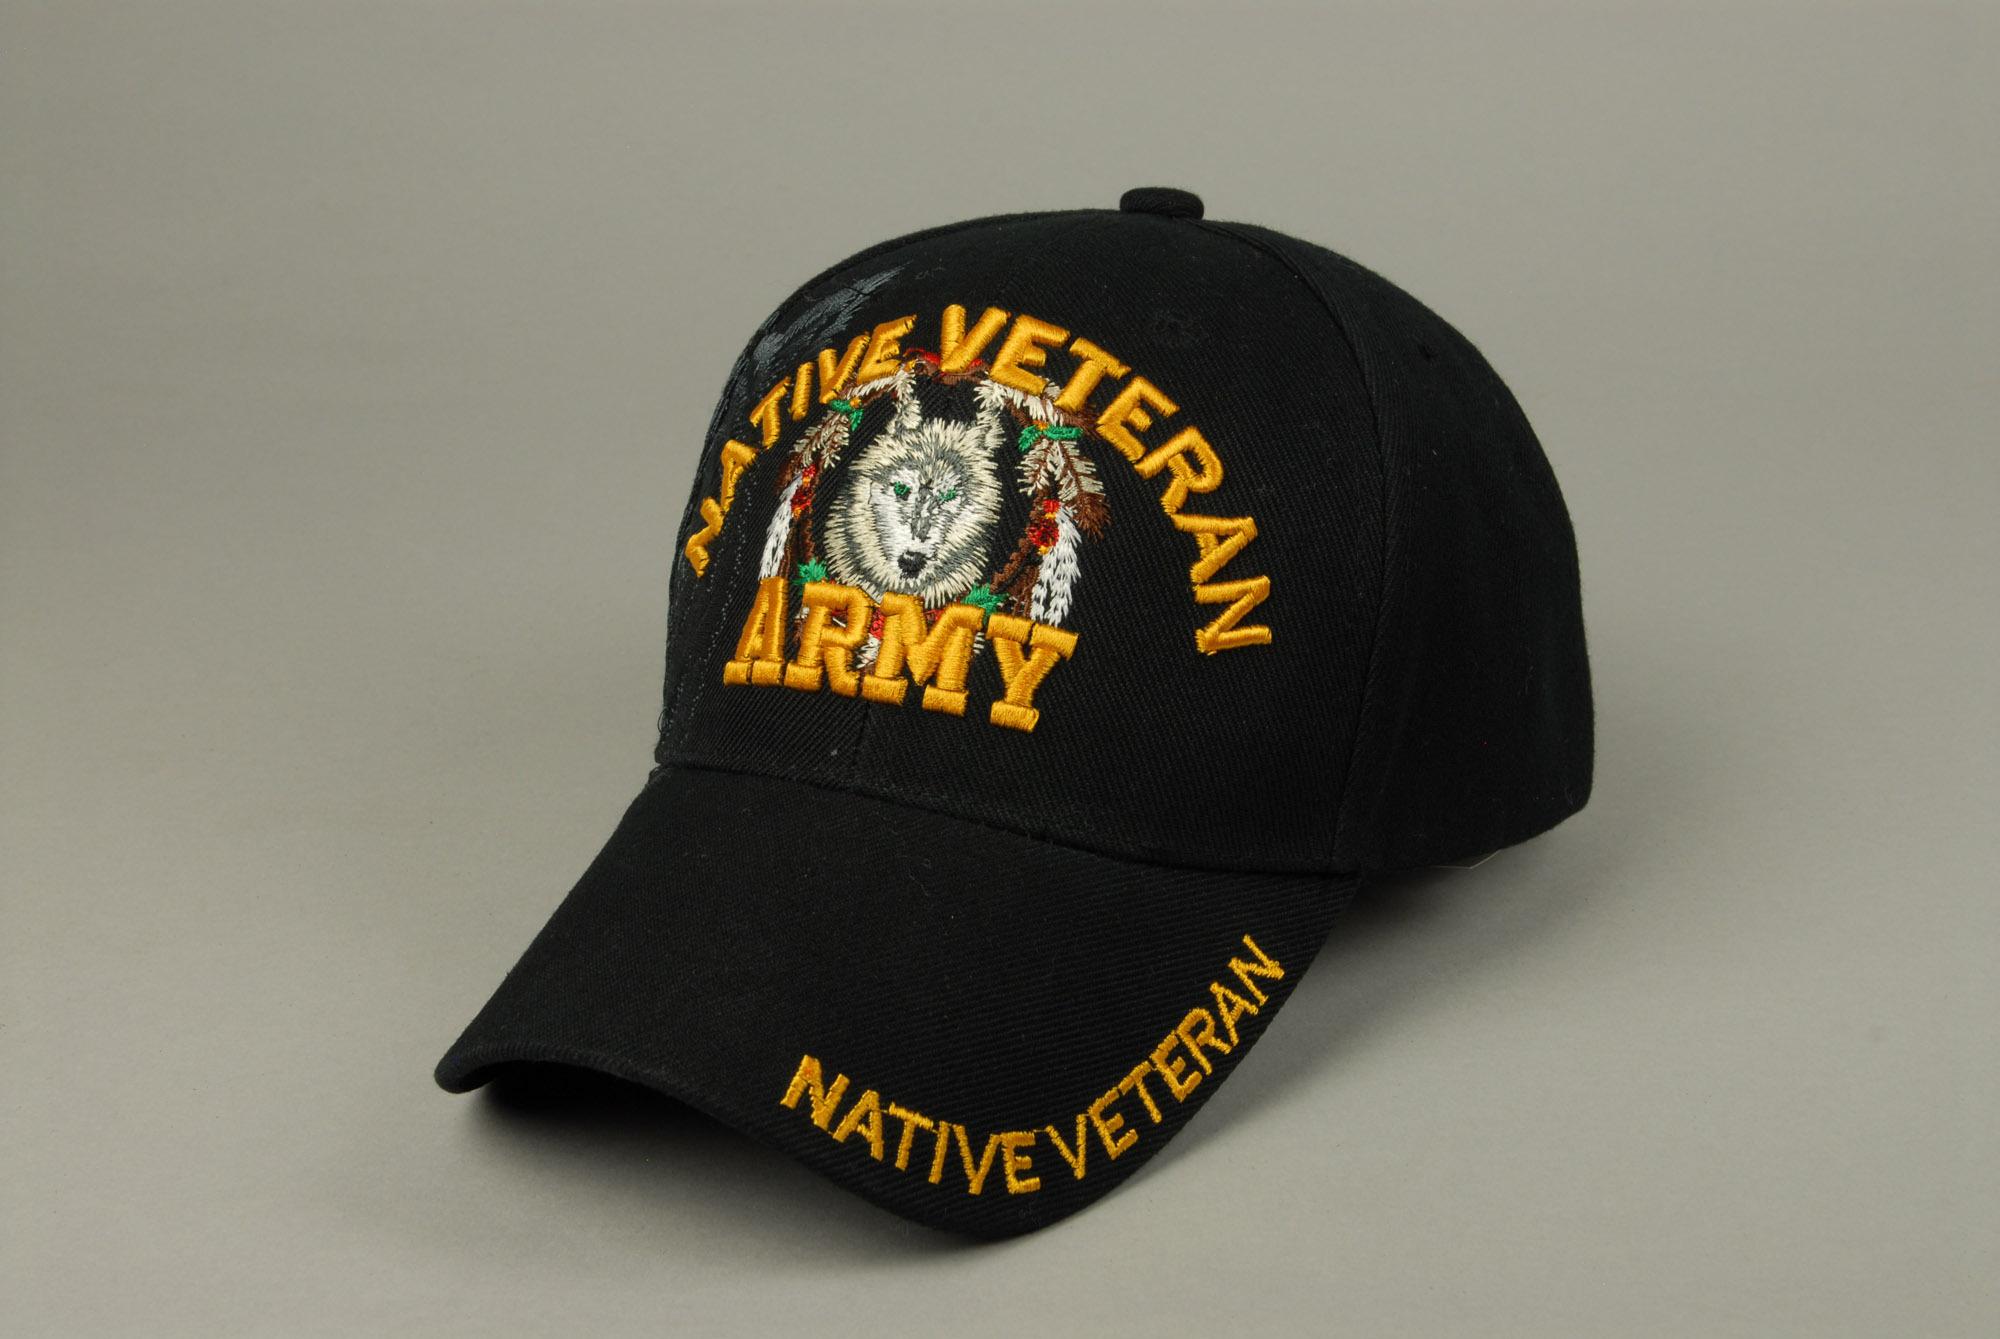 Native Veteran Army